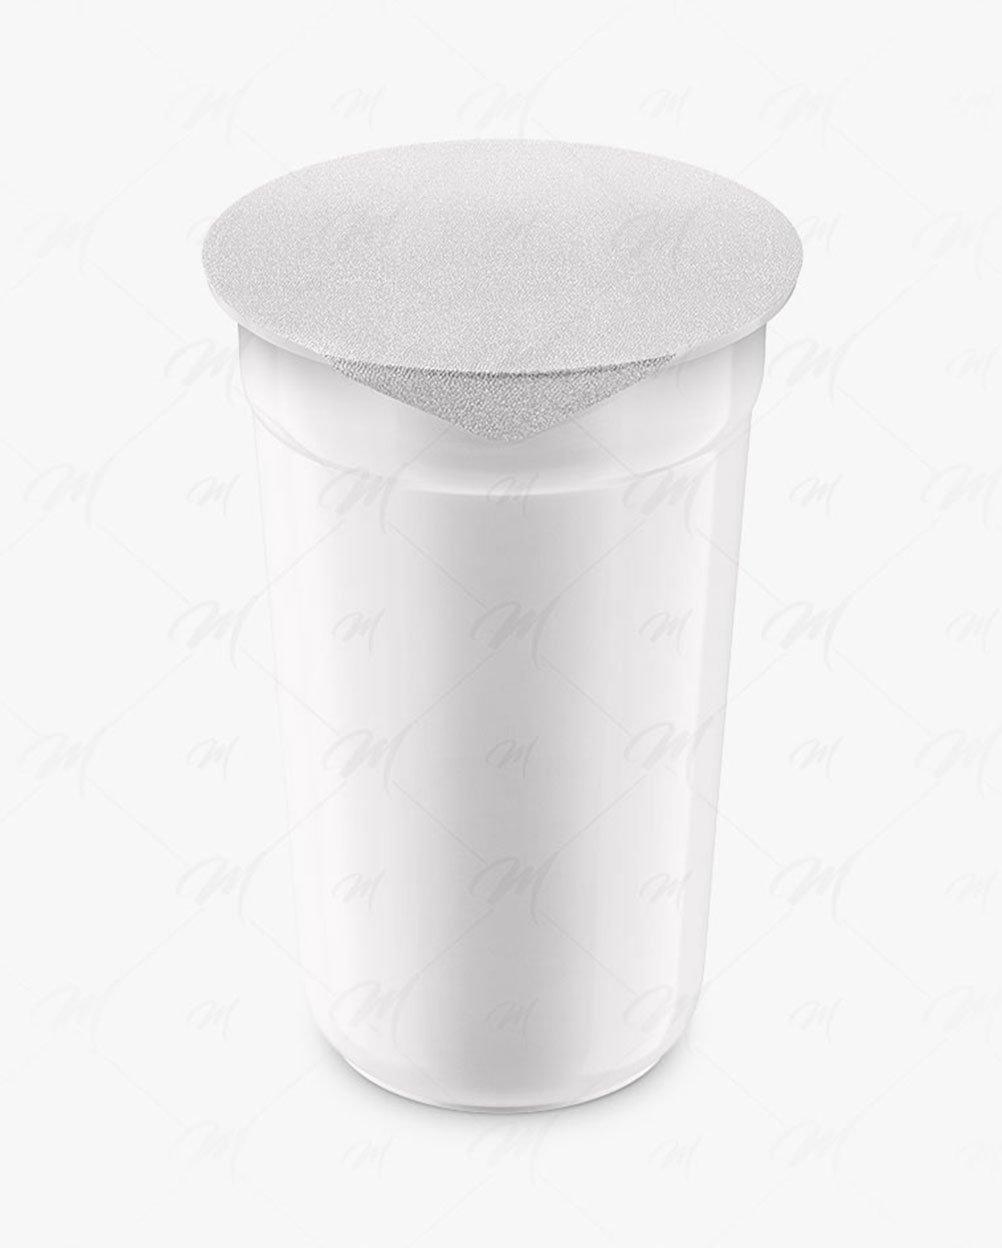 plastic cup mockup